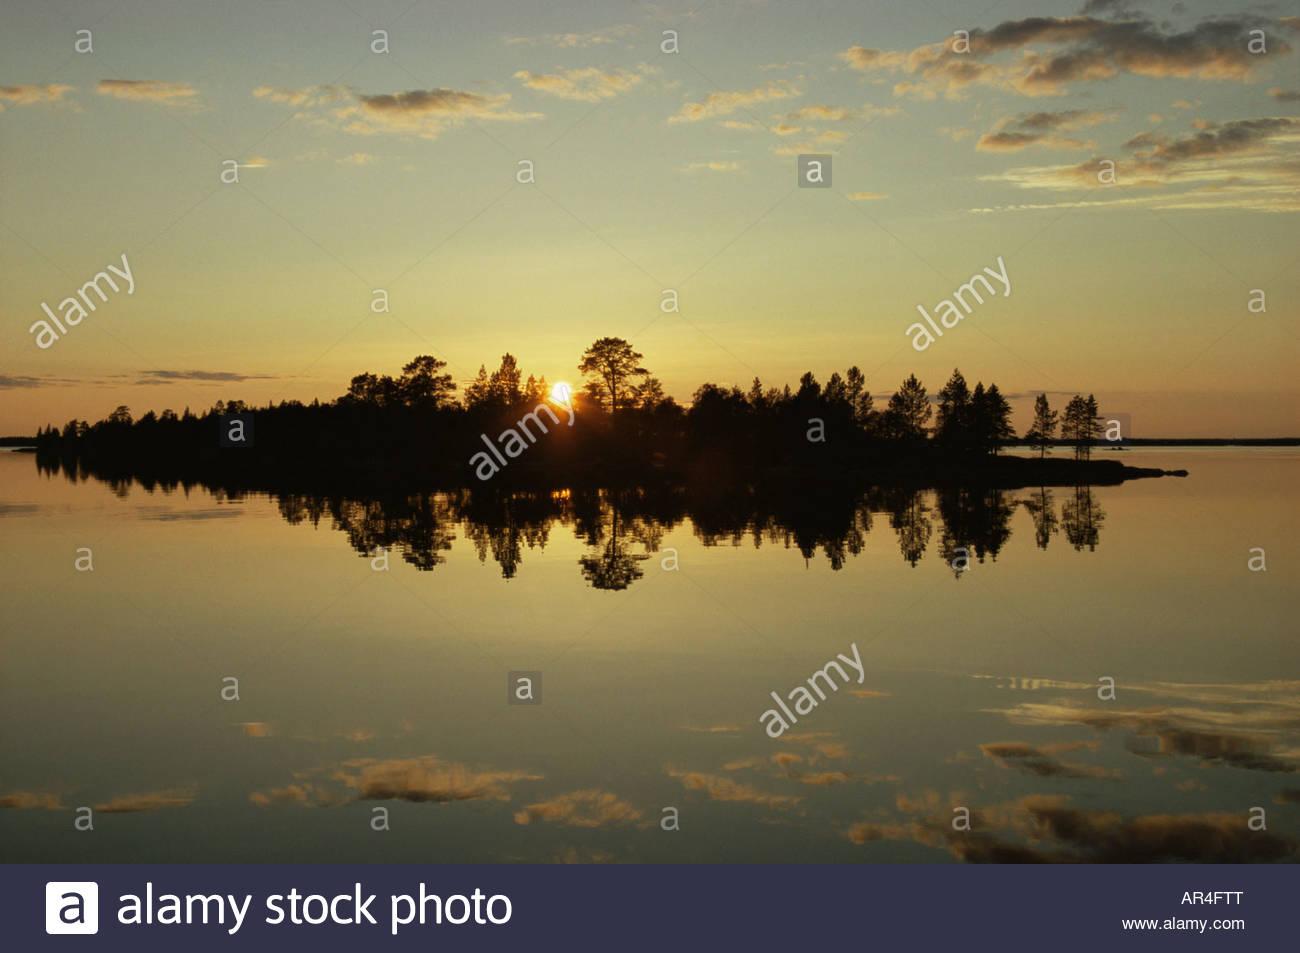 Midnight sun at lake inari finland - Stock Image